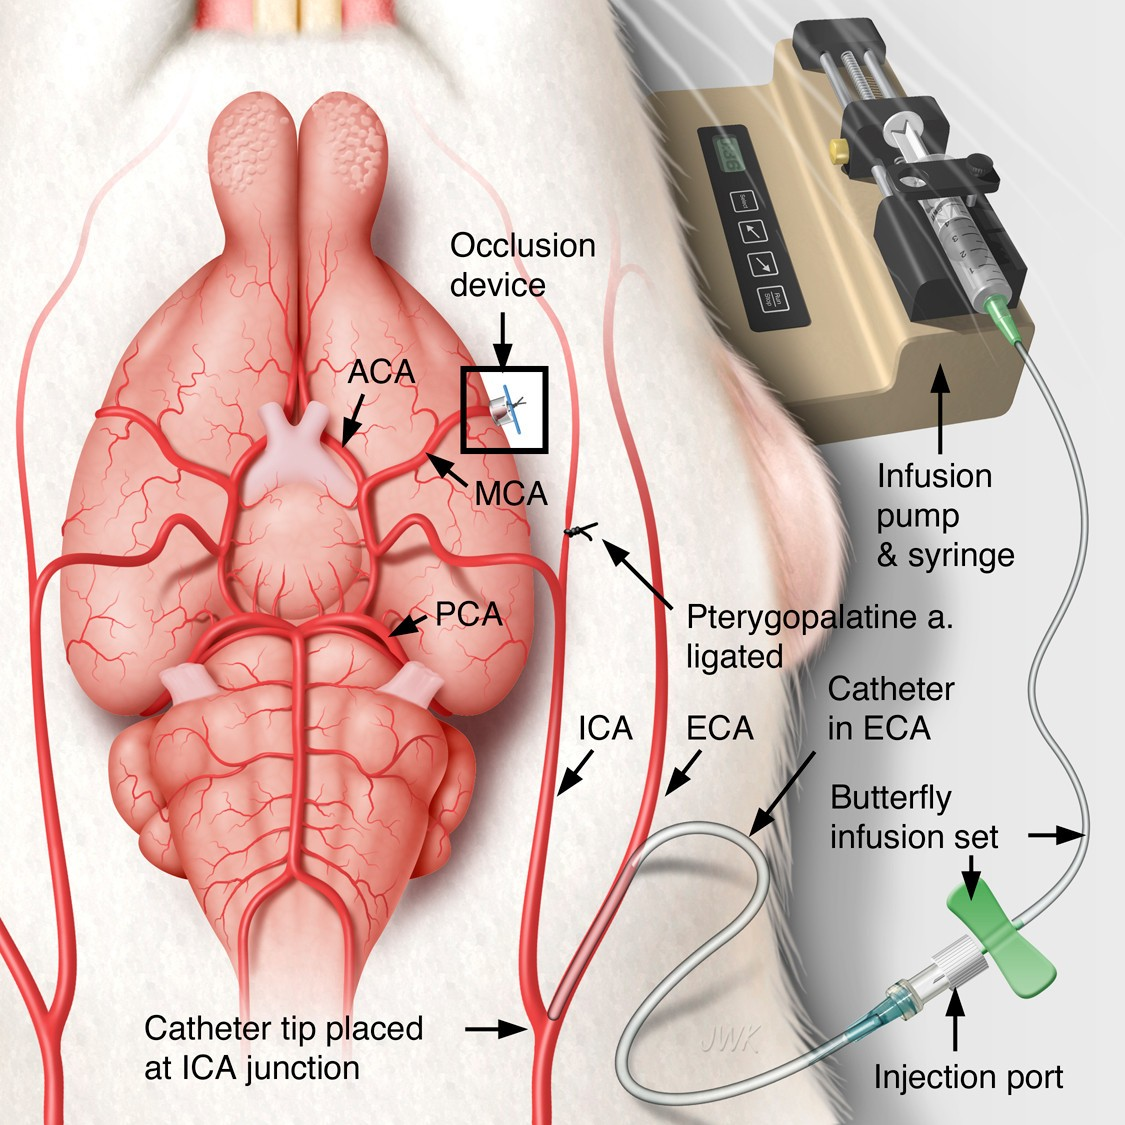 Intra-arterial administration of recombinant tissue-type plasminogen ...